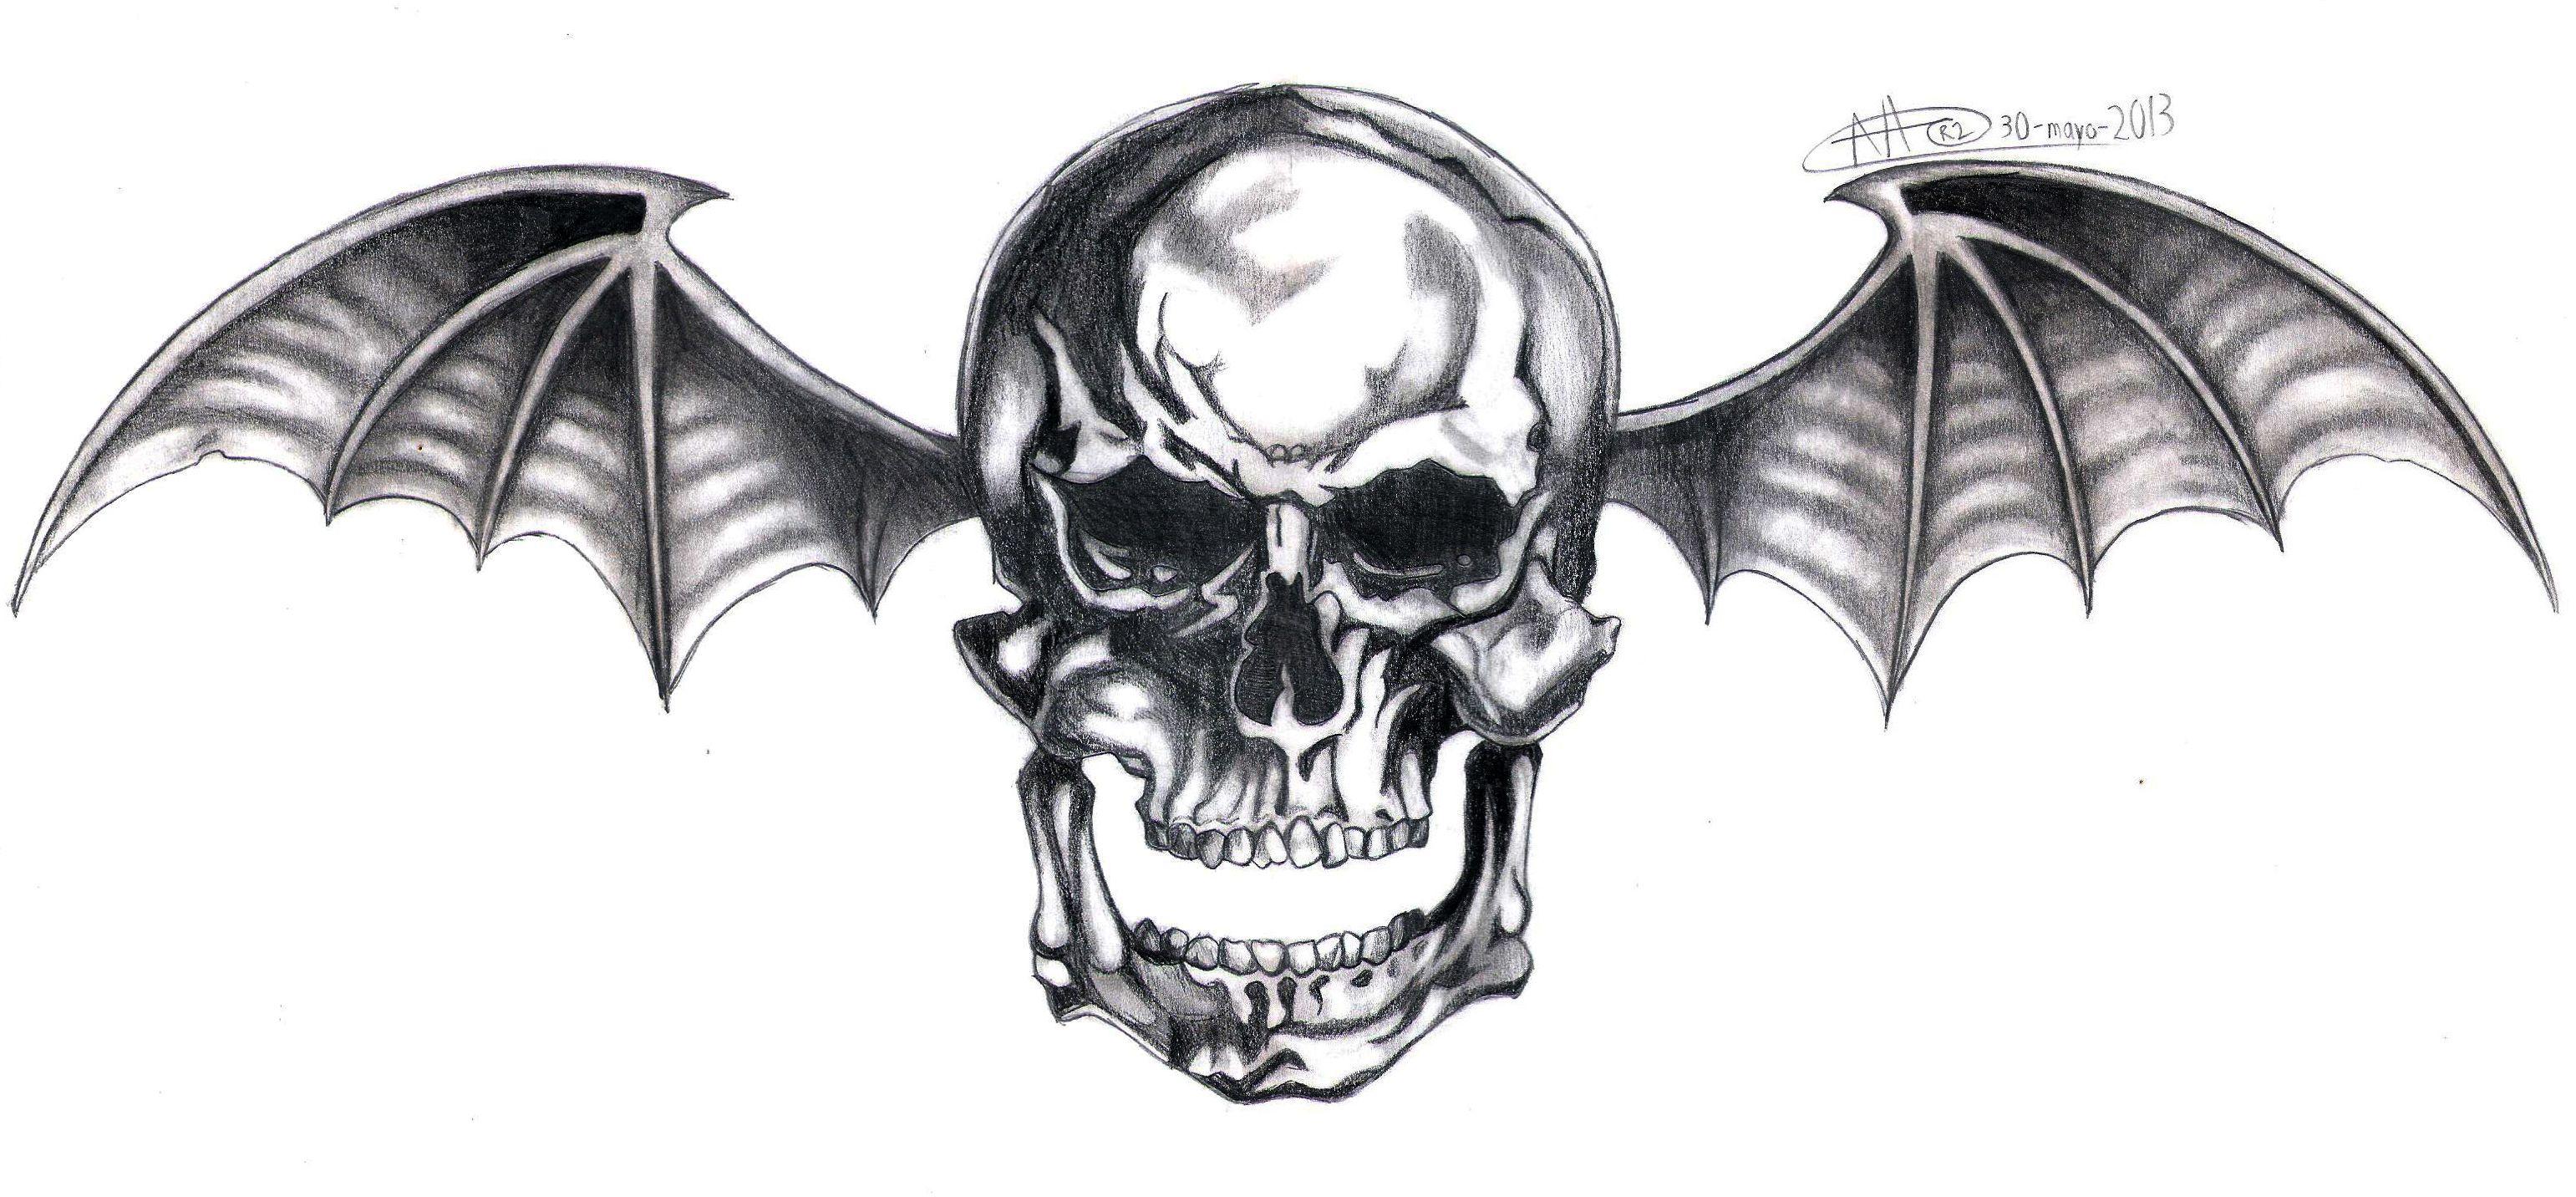 Avenged Sevenfold logo. 3052013 Bat tattoo, Avenged